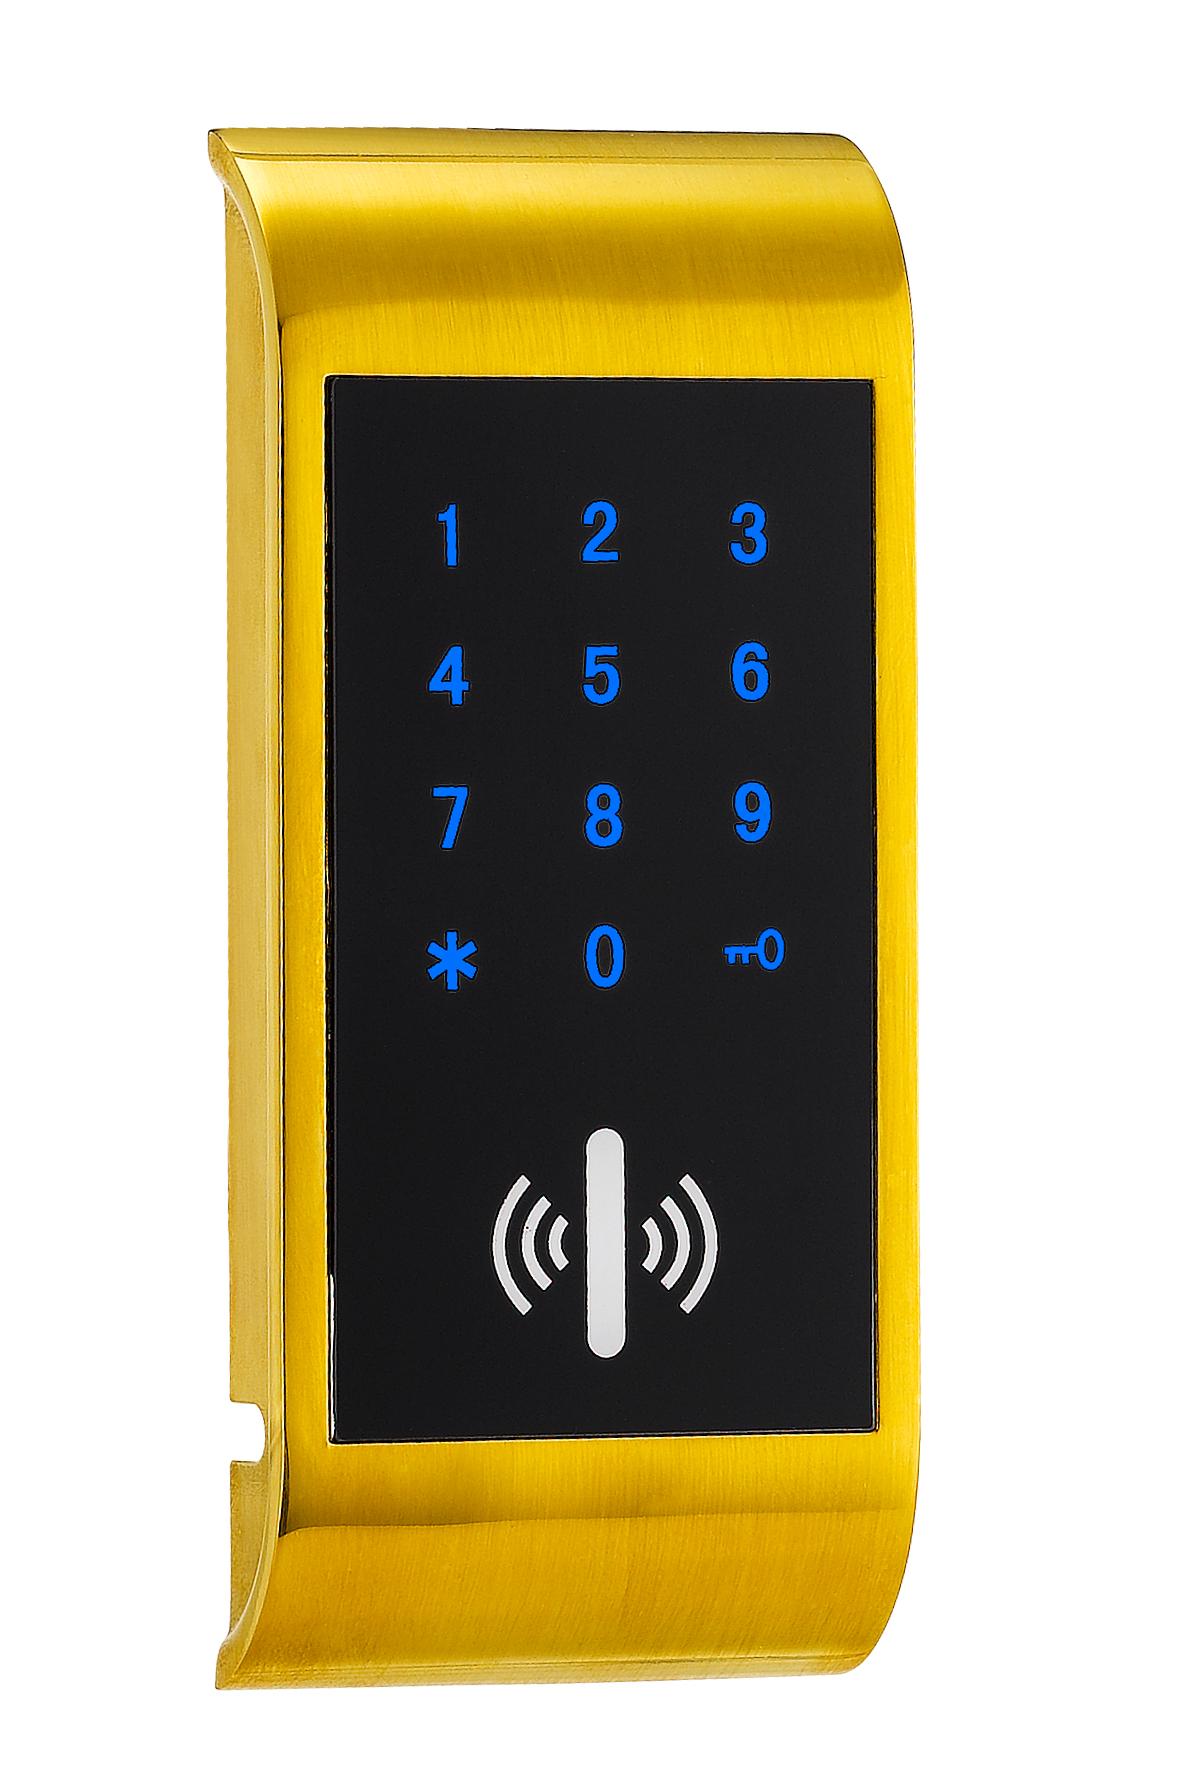 Locking-密码126-J 桑拿锁